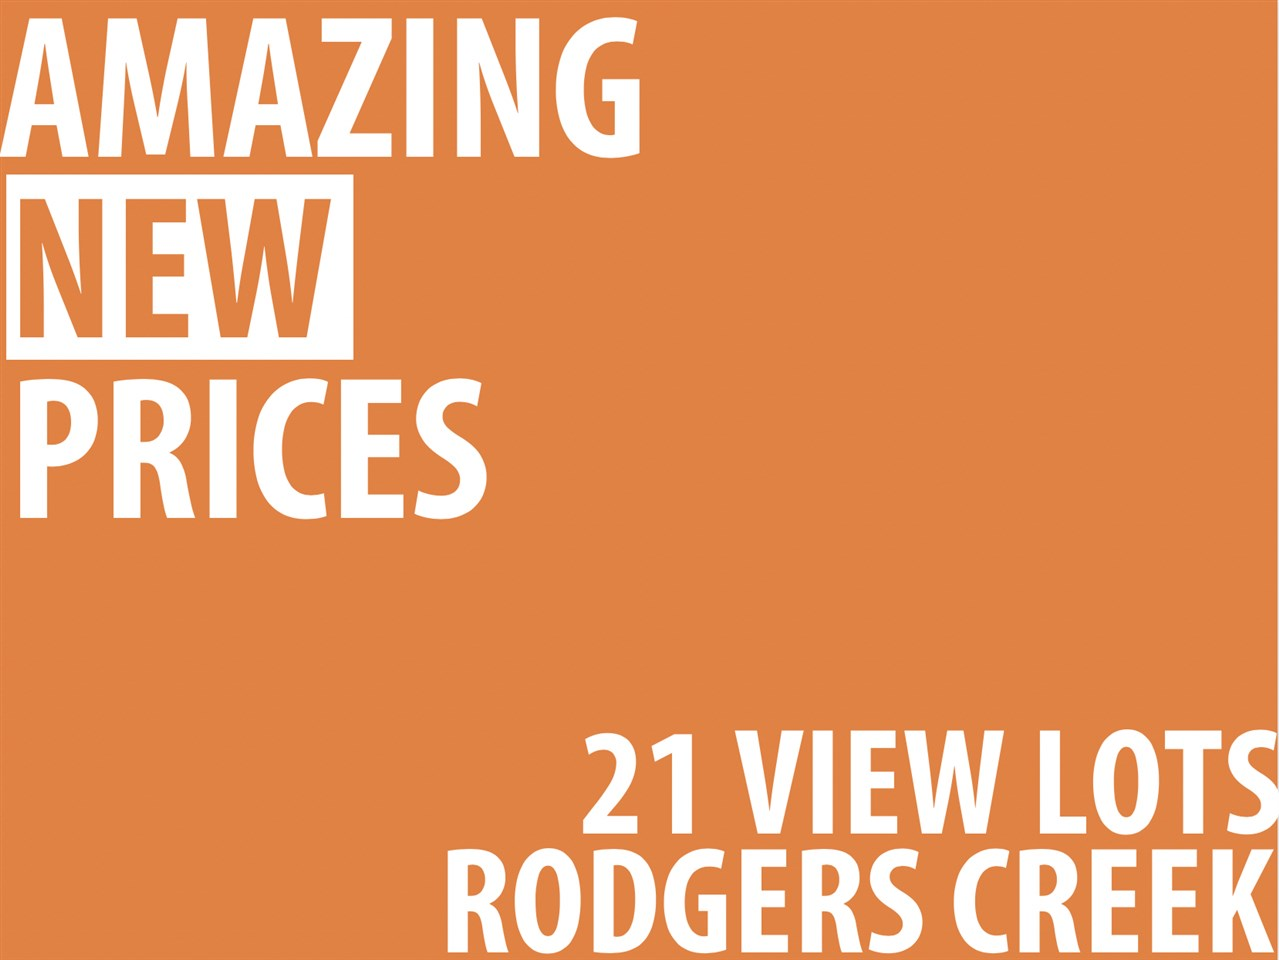 2892 RODGERS CREEK LANE - MLS® # R2423968